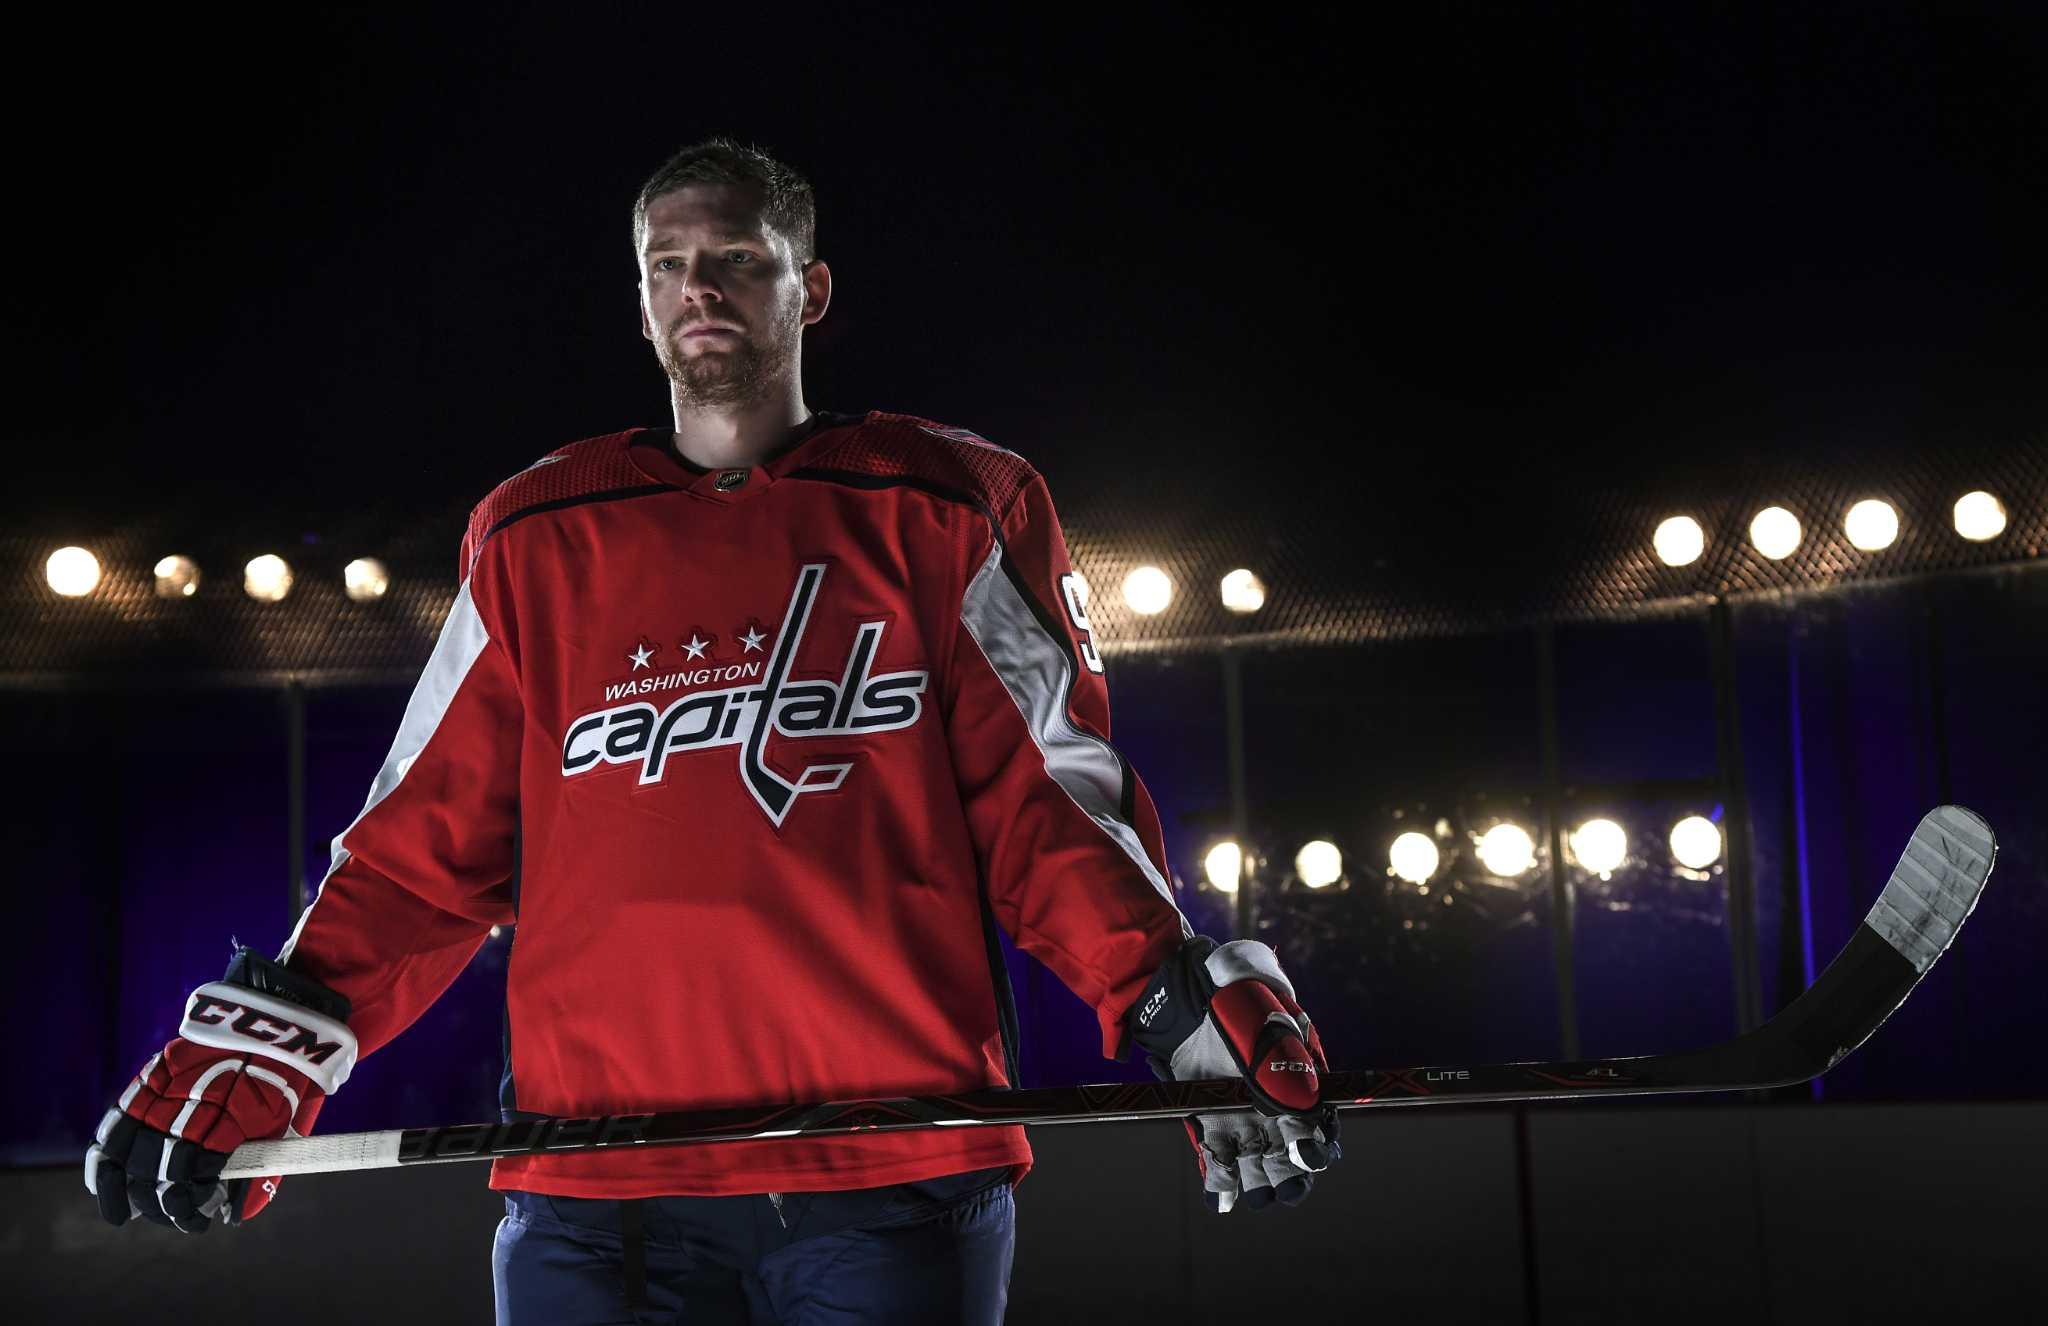 b8975efaac8 Caps think Evgeny Kuznetsov is one of the NHL s best